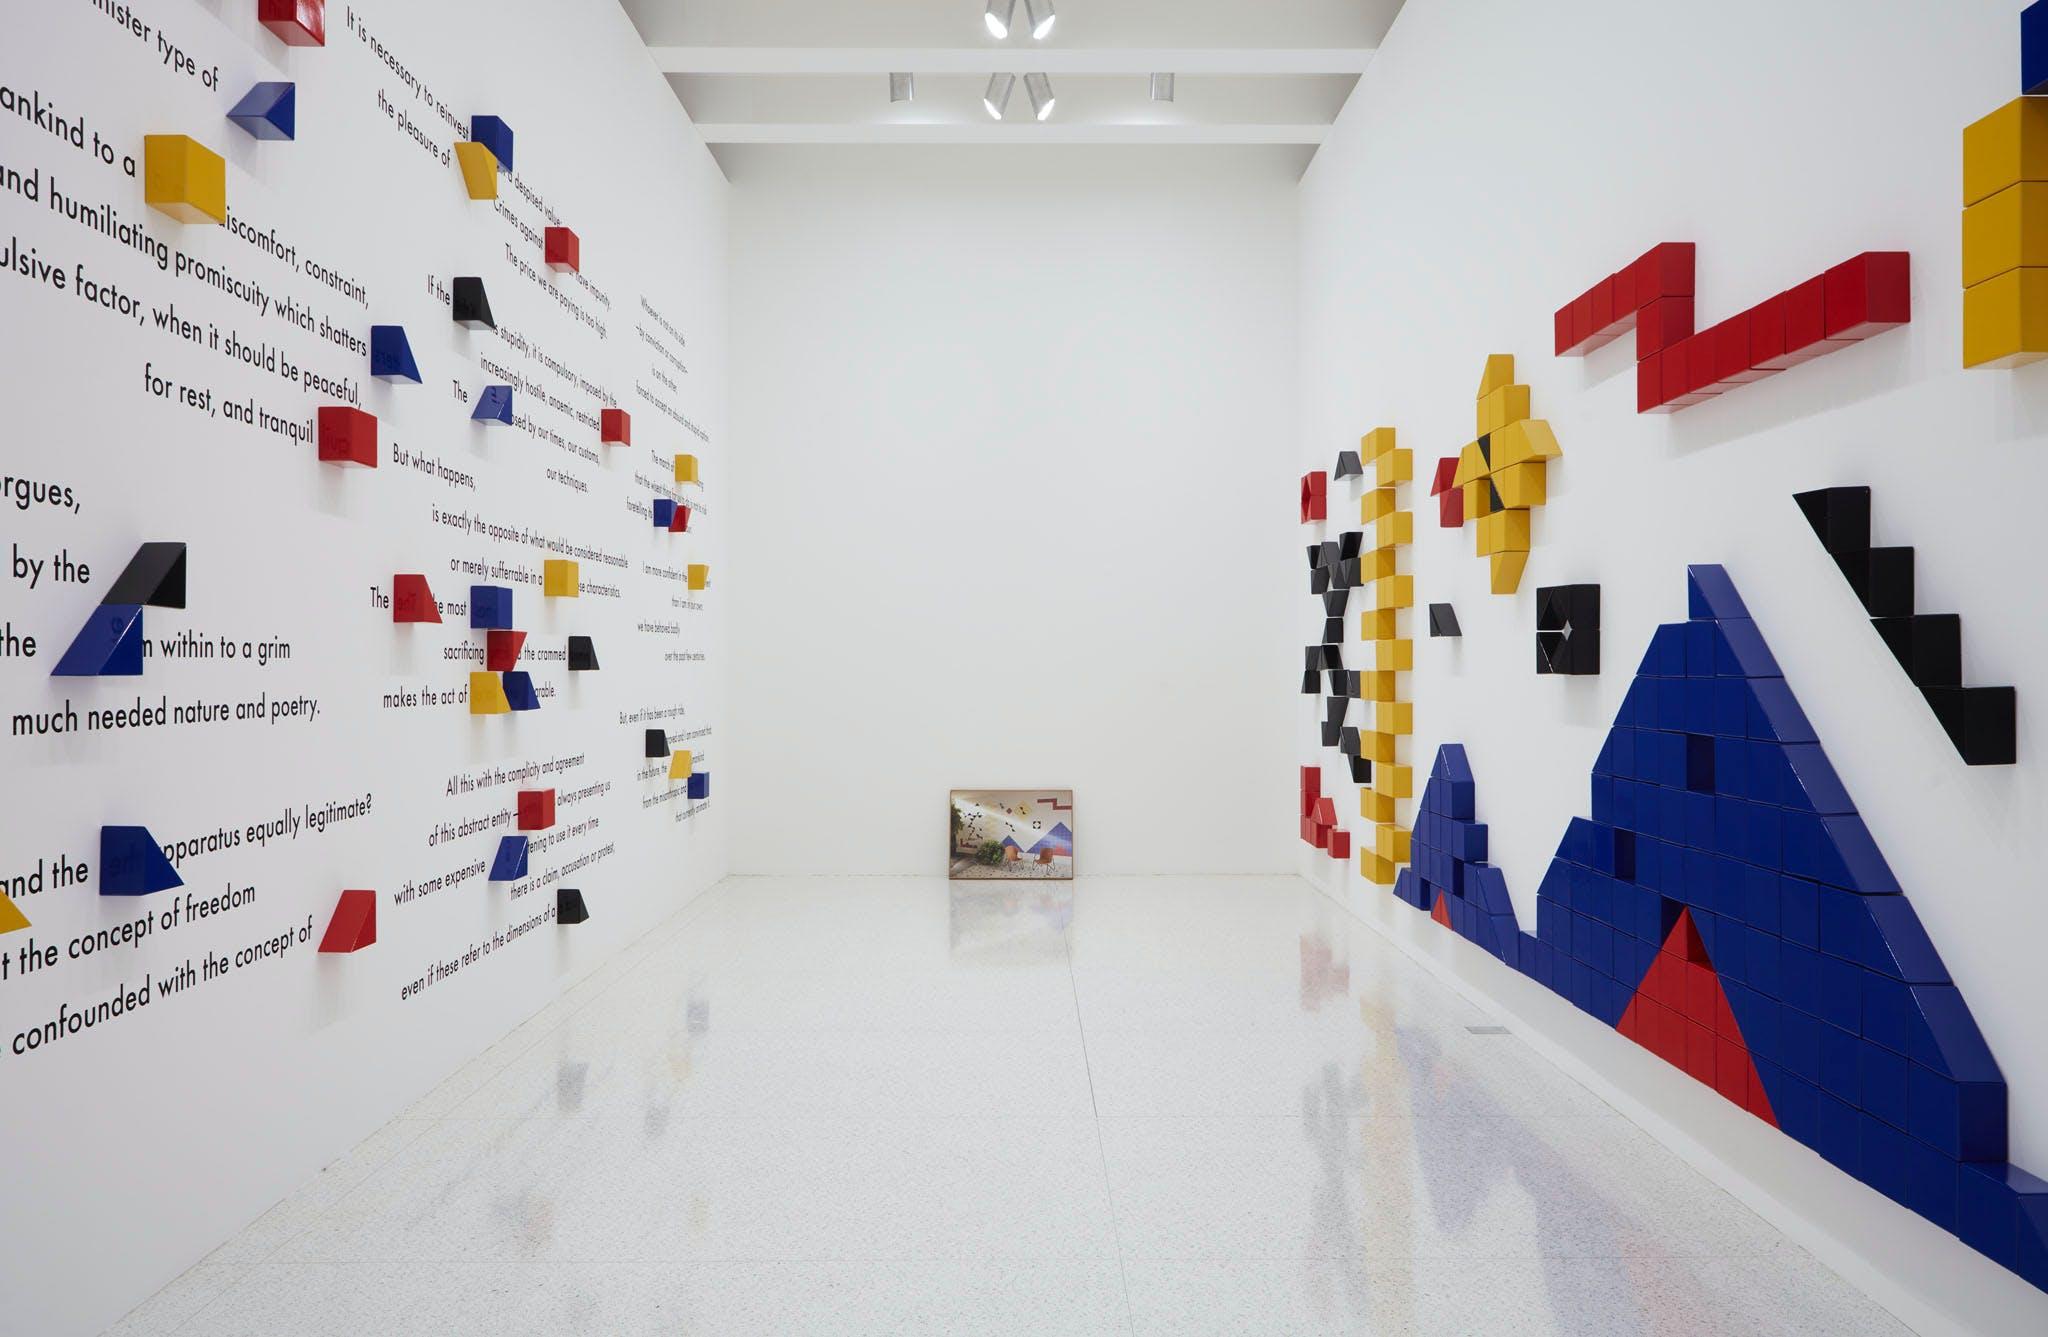 View of the exhibition Question the Wall Itself, 2016; Jonathas de Andrade, Nostalgia, Sentimento de Classe (Nostalgia, a Class Sentiment), 2012 (Photo: Gene Pittman, ©Walker Art Center)